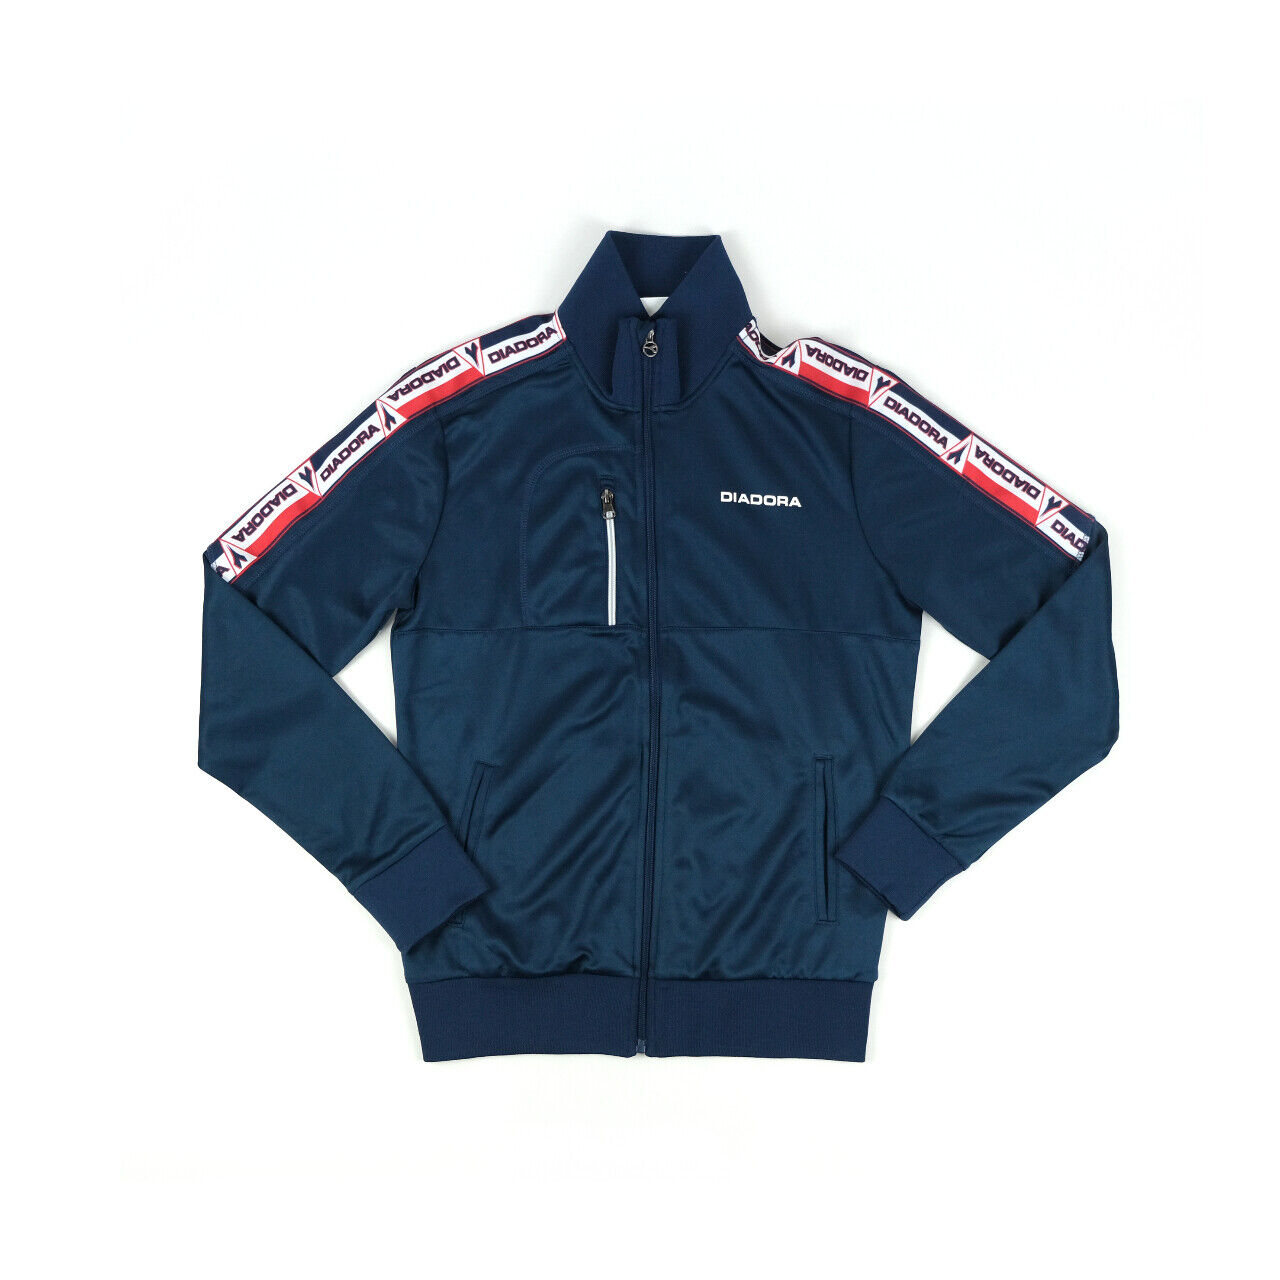 Diadora y2k taped navy track jacket Small size